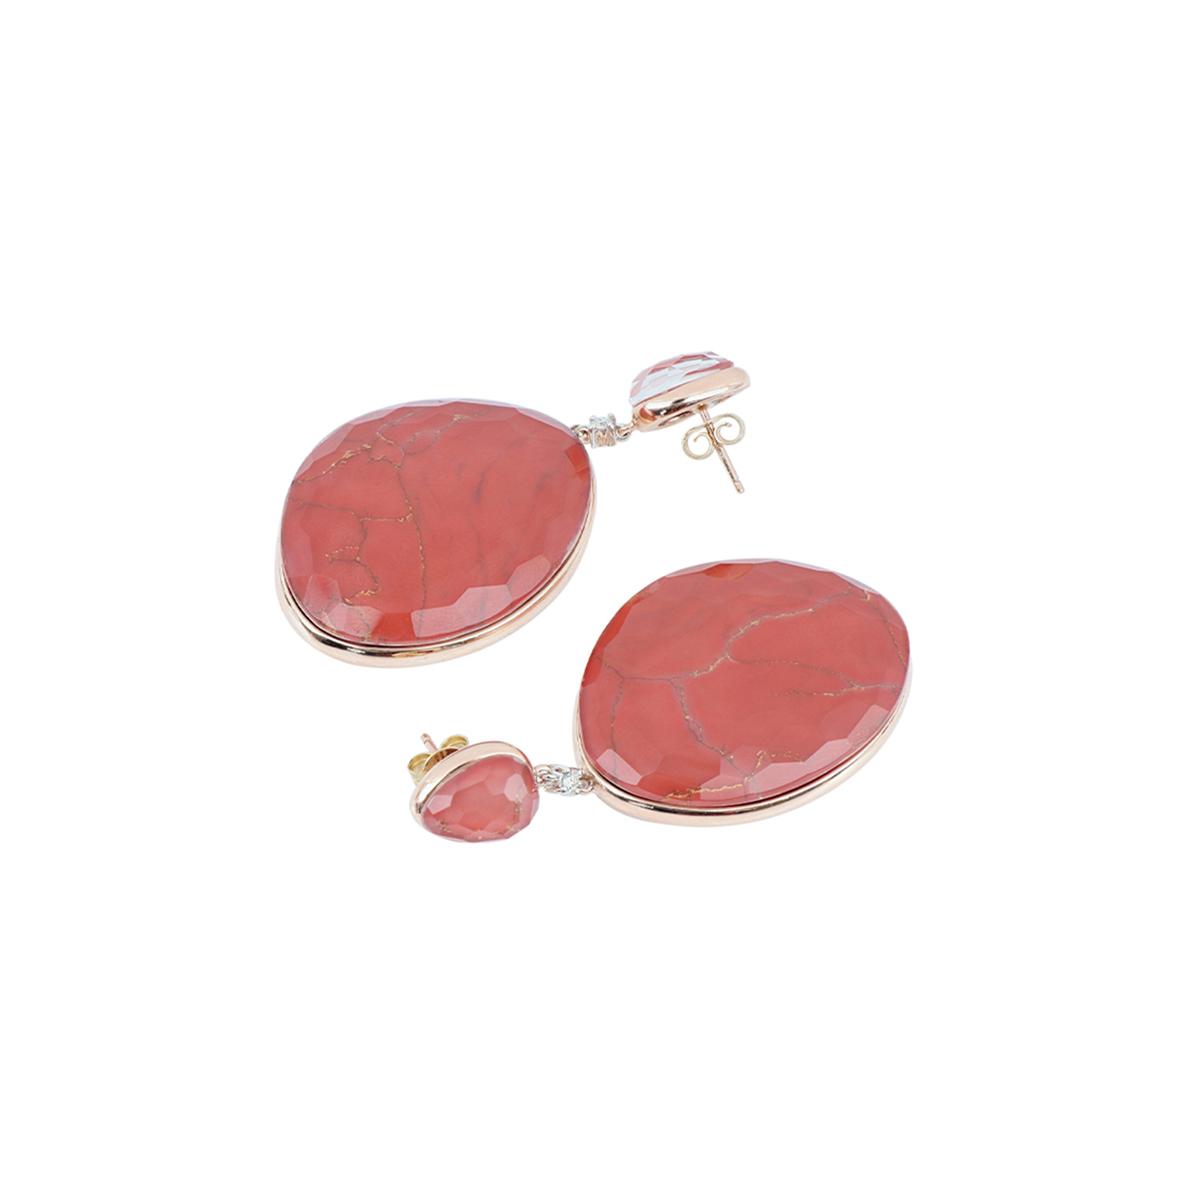 Multiple Facet Cut Quartz And Carnelian Stone Earrings